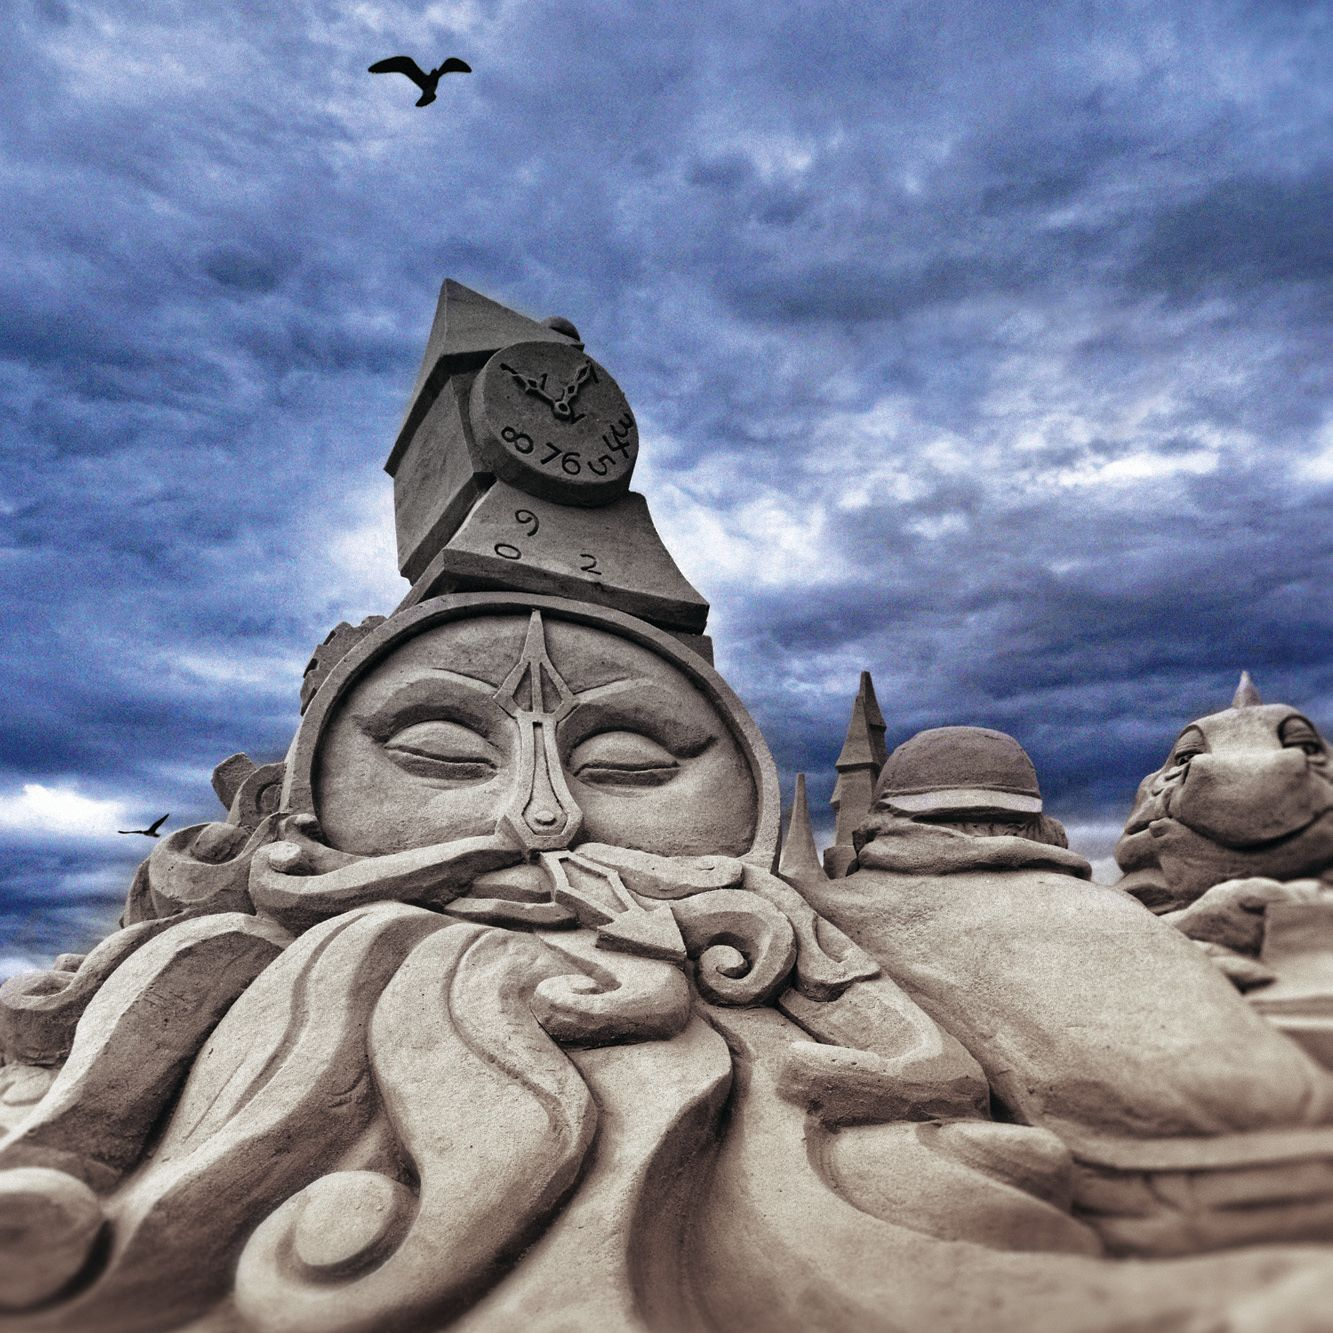 Srq sand sculptre odigs4